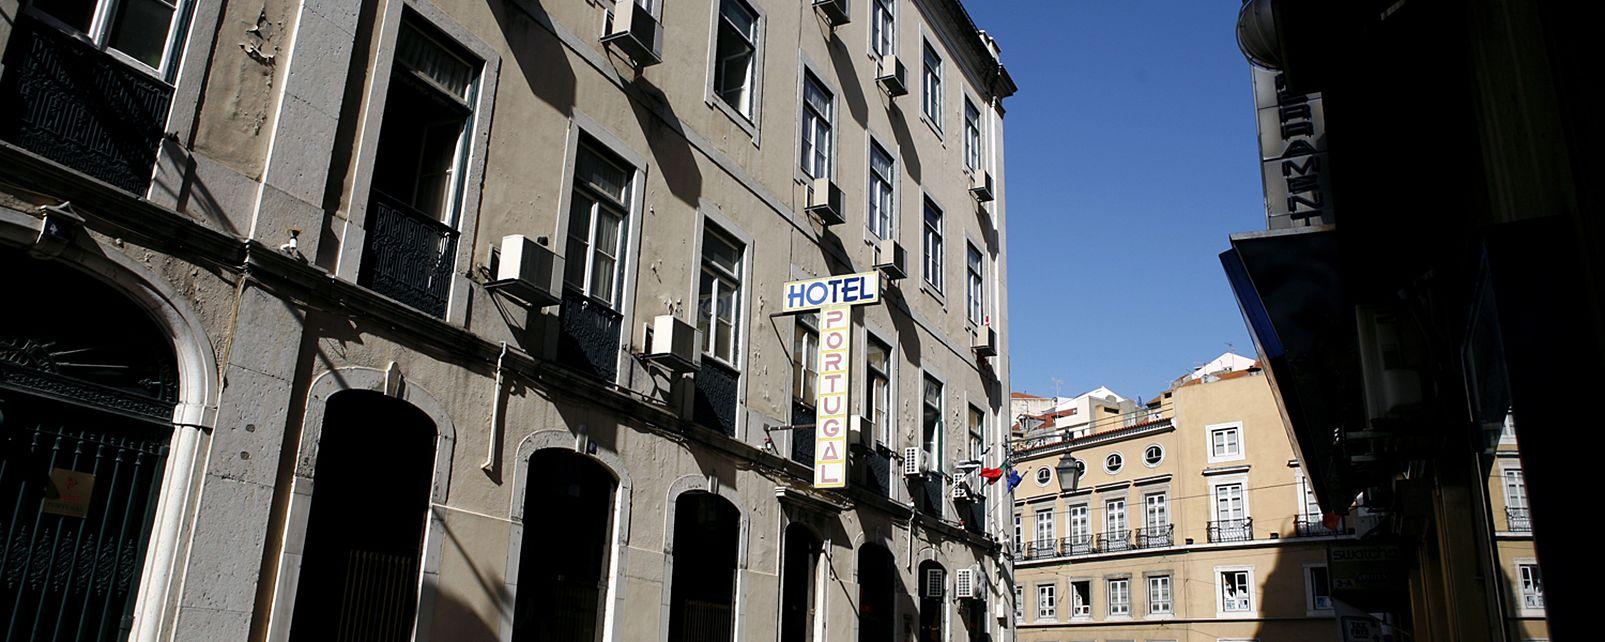 Hotel Portugal